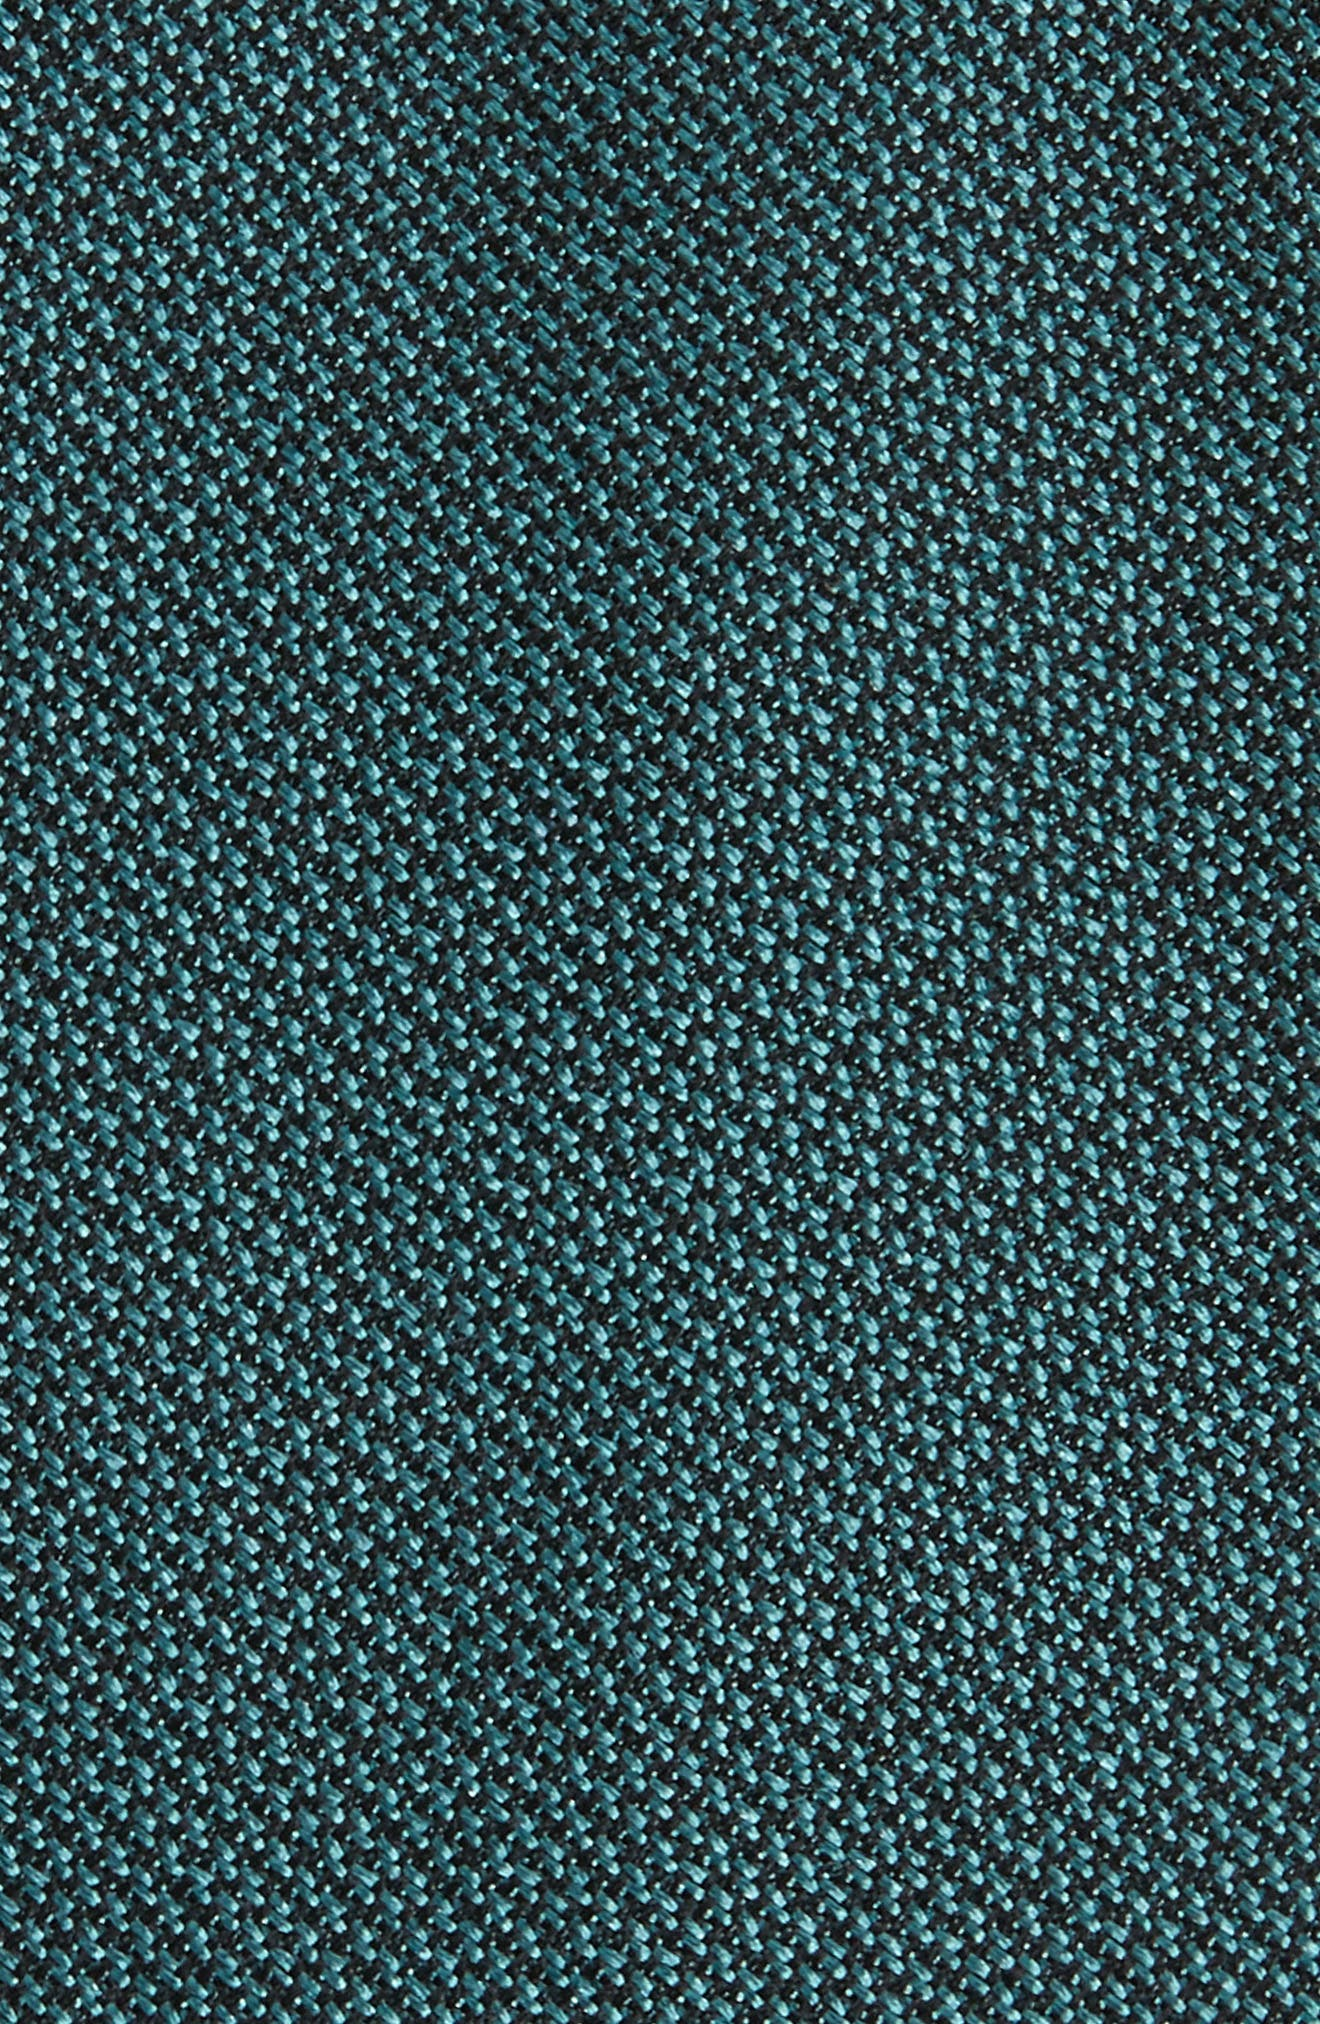 Alternate Image 2  - Calibrate Half & Half Panel Tie